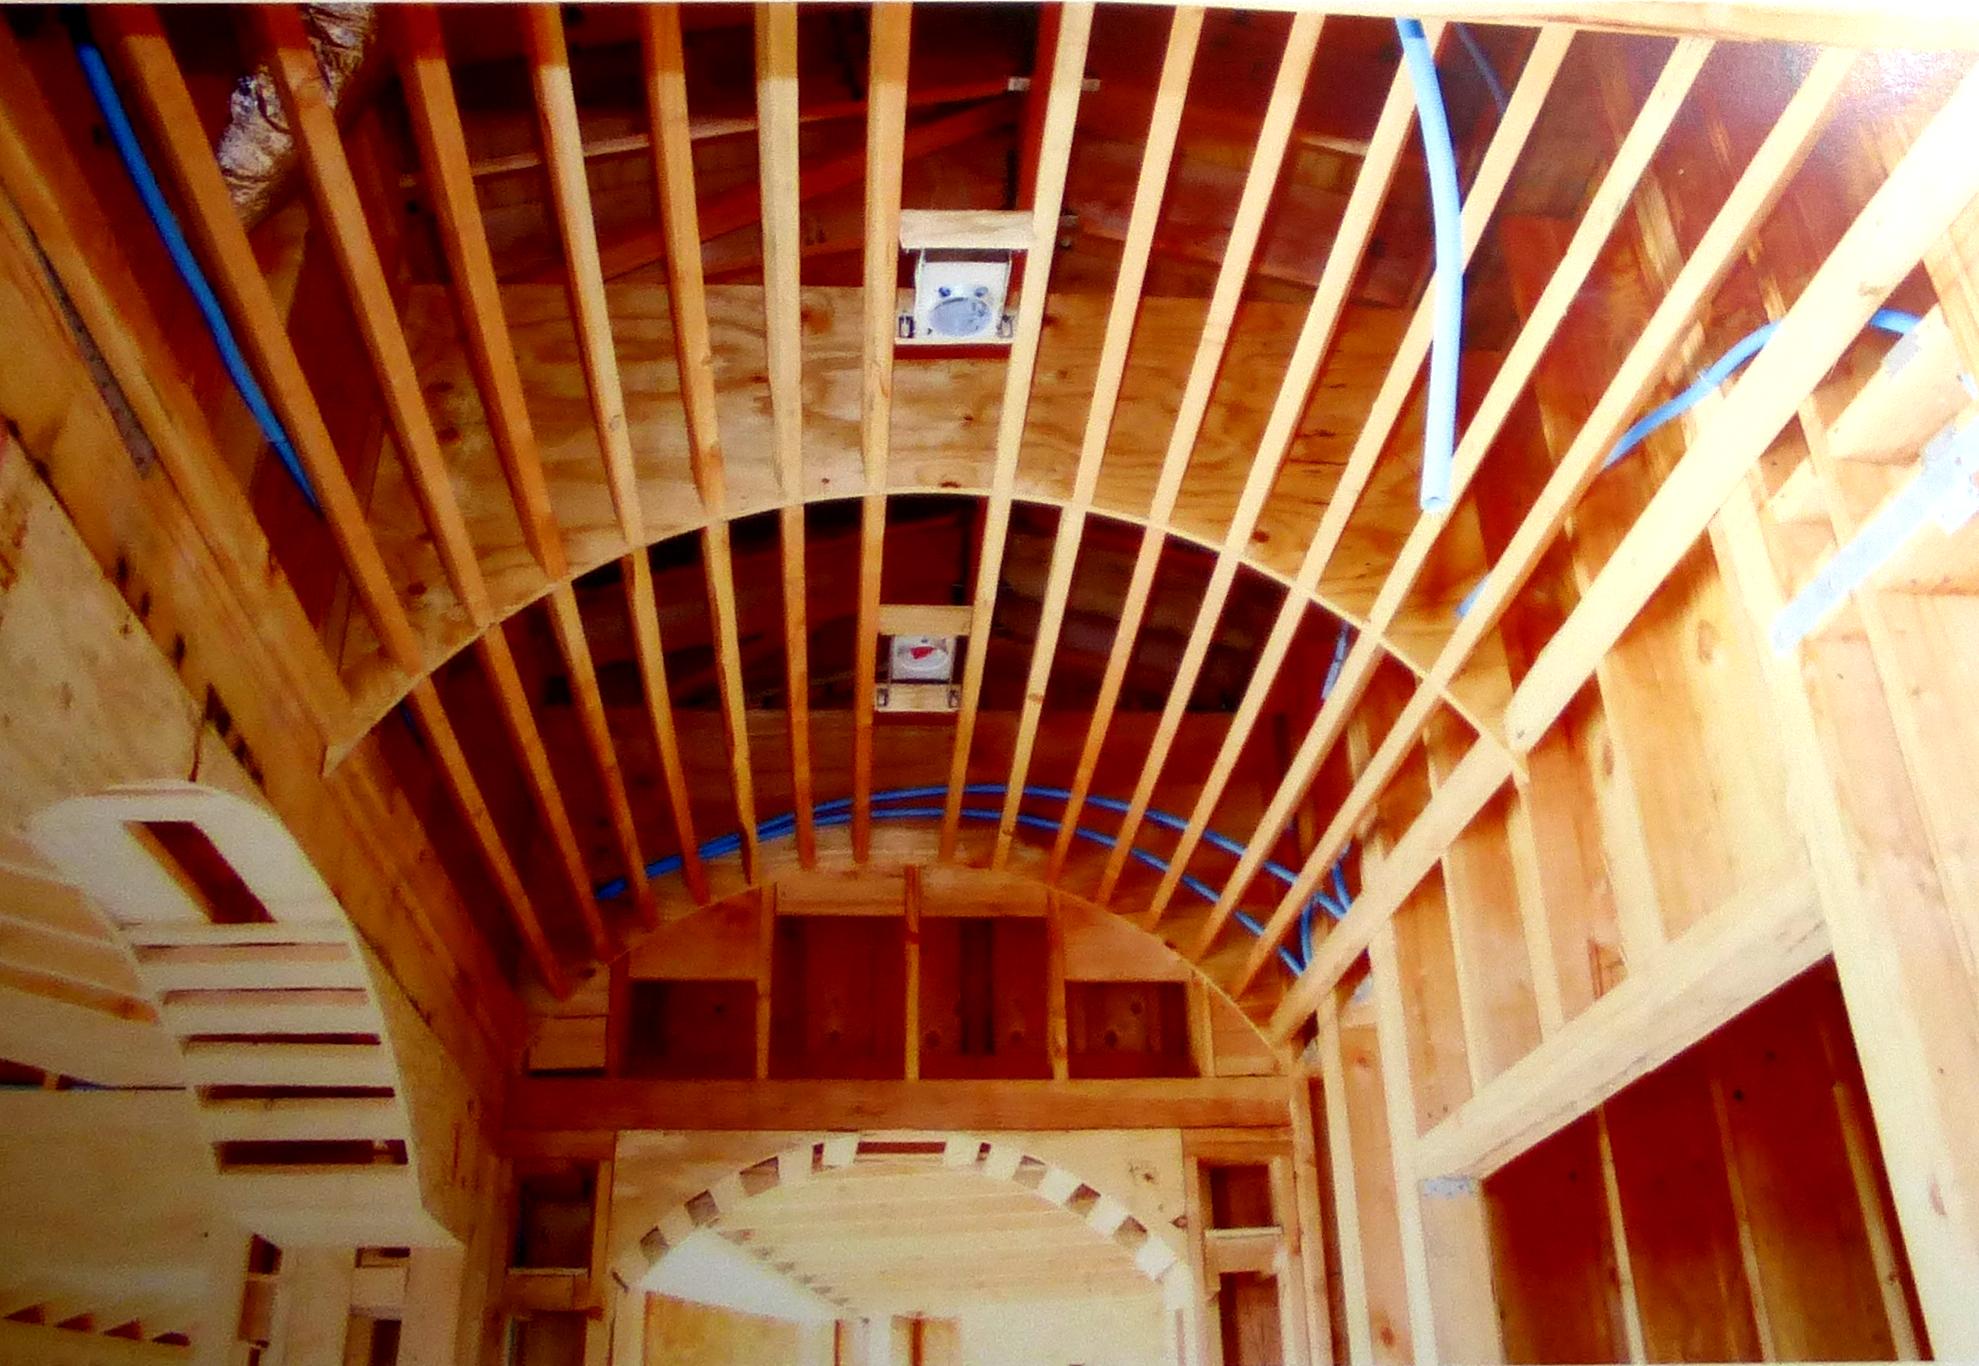 Malibu Hillside Residence interior